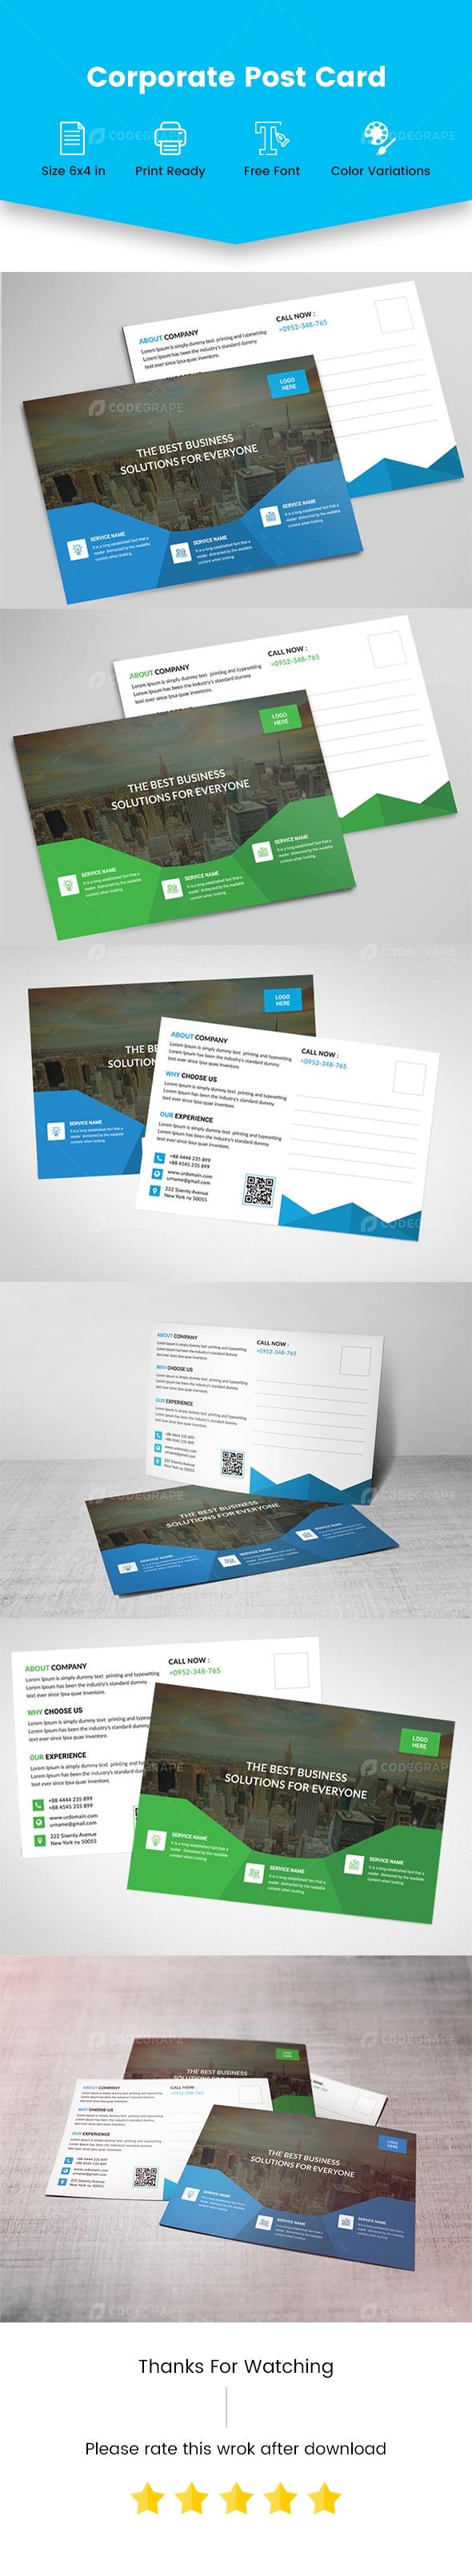 Corporate Post Card Templates